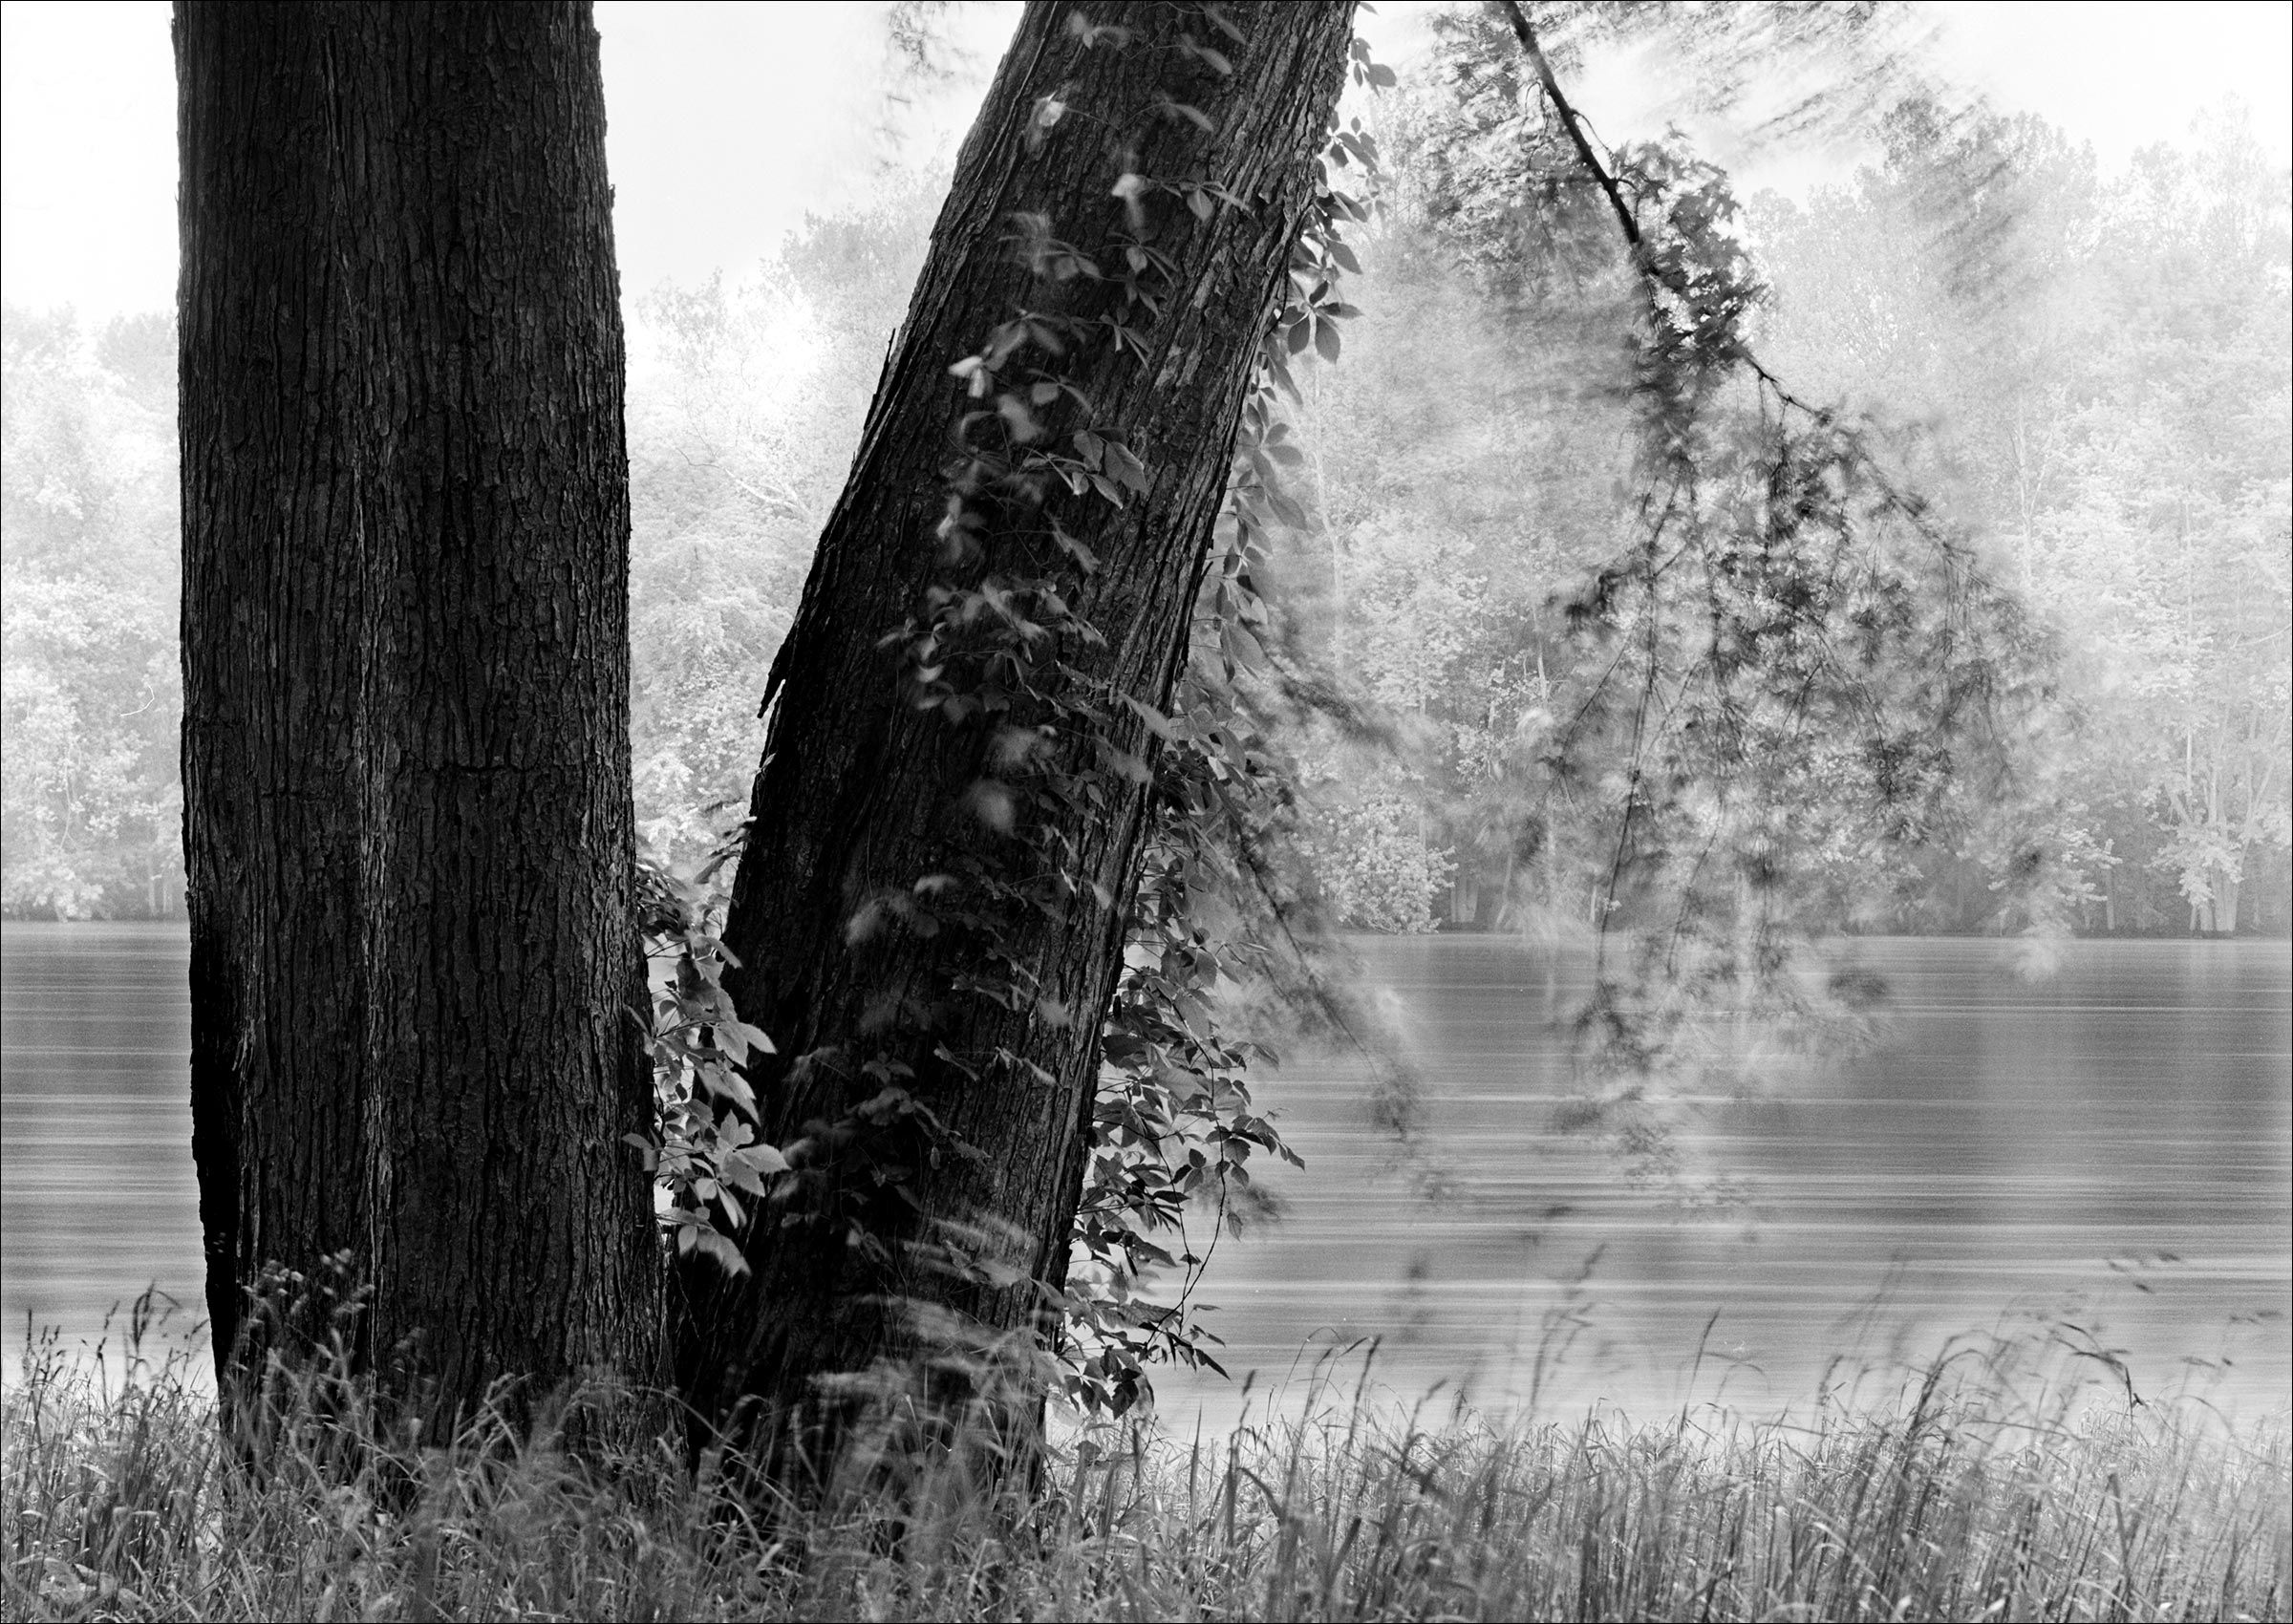 TreesAlongPotomac_BlackandWhite_Photography.jpg